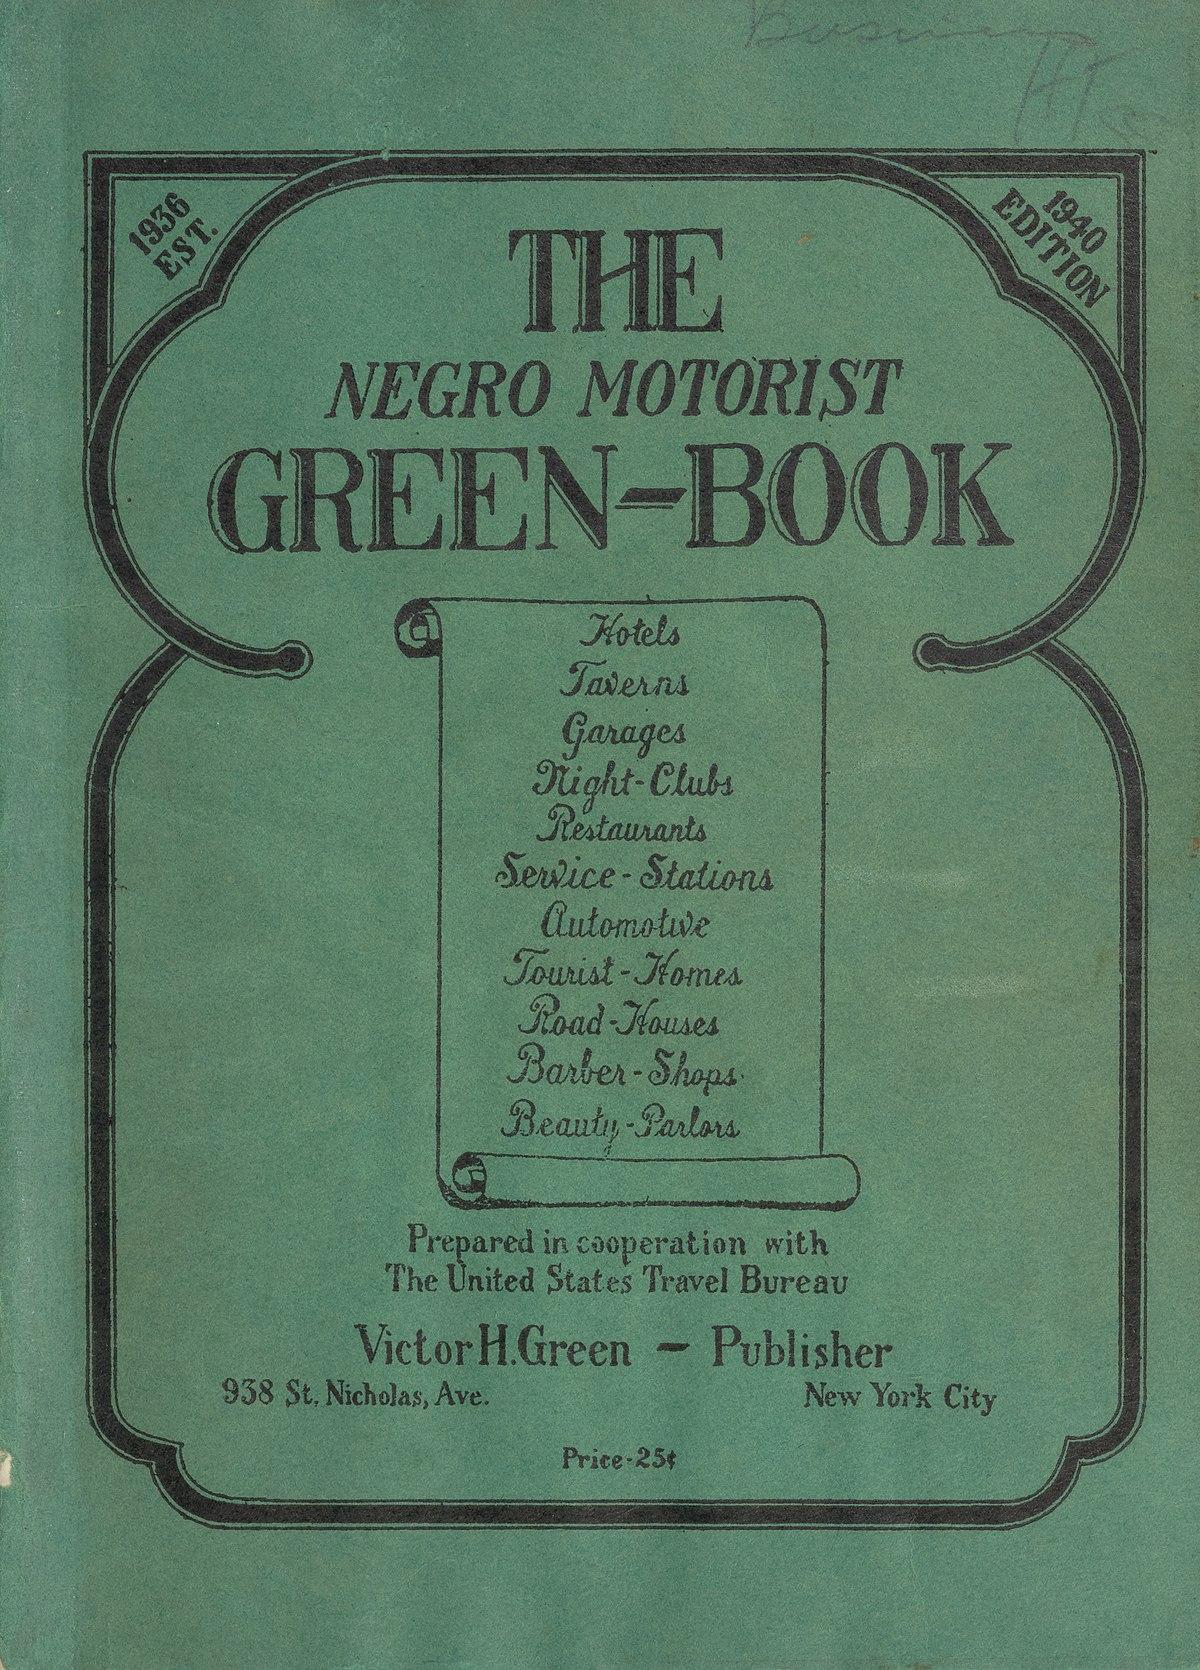 The Negro Motorist Green Book - Wikipedia